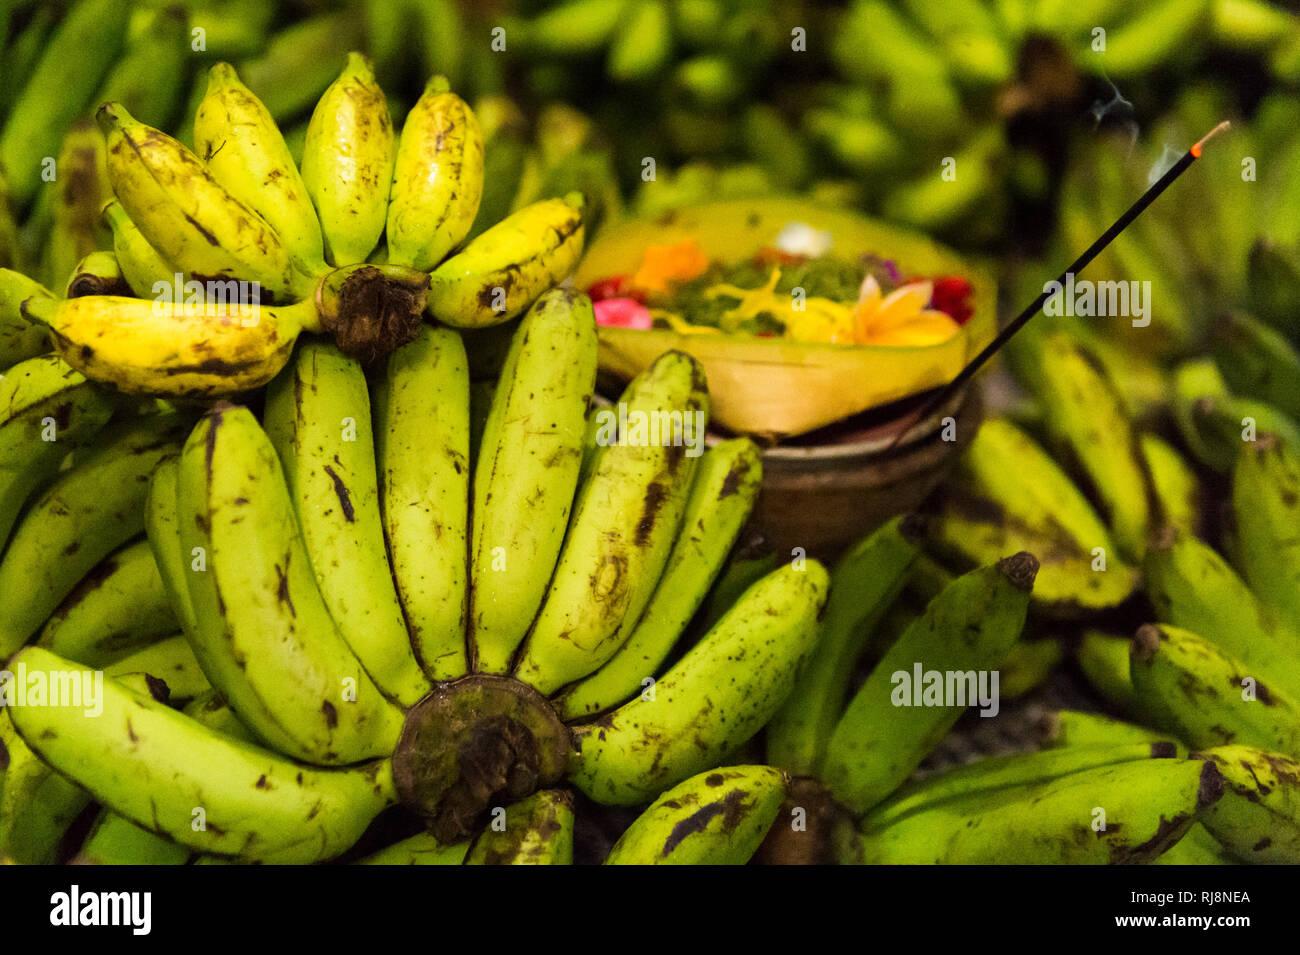 Denpasar, Kumbasari Markt, Verkauf von Bananen - Stock Image